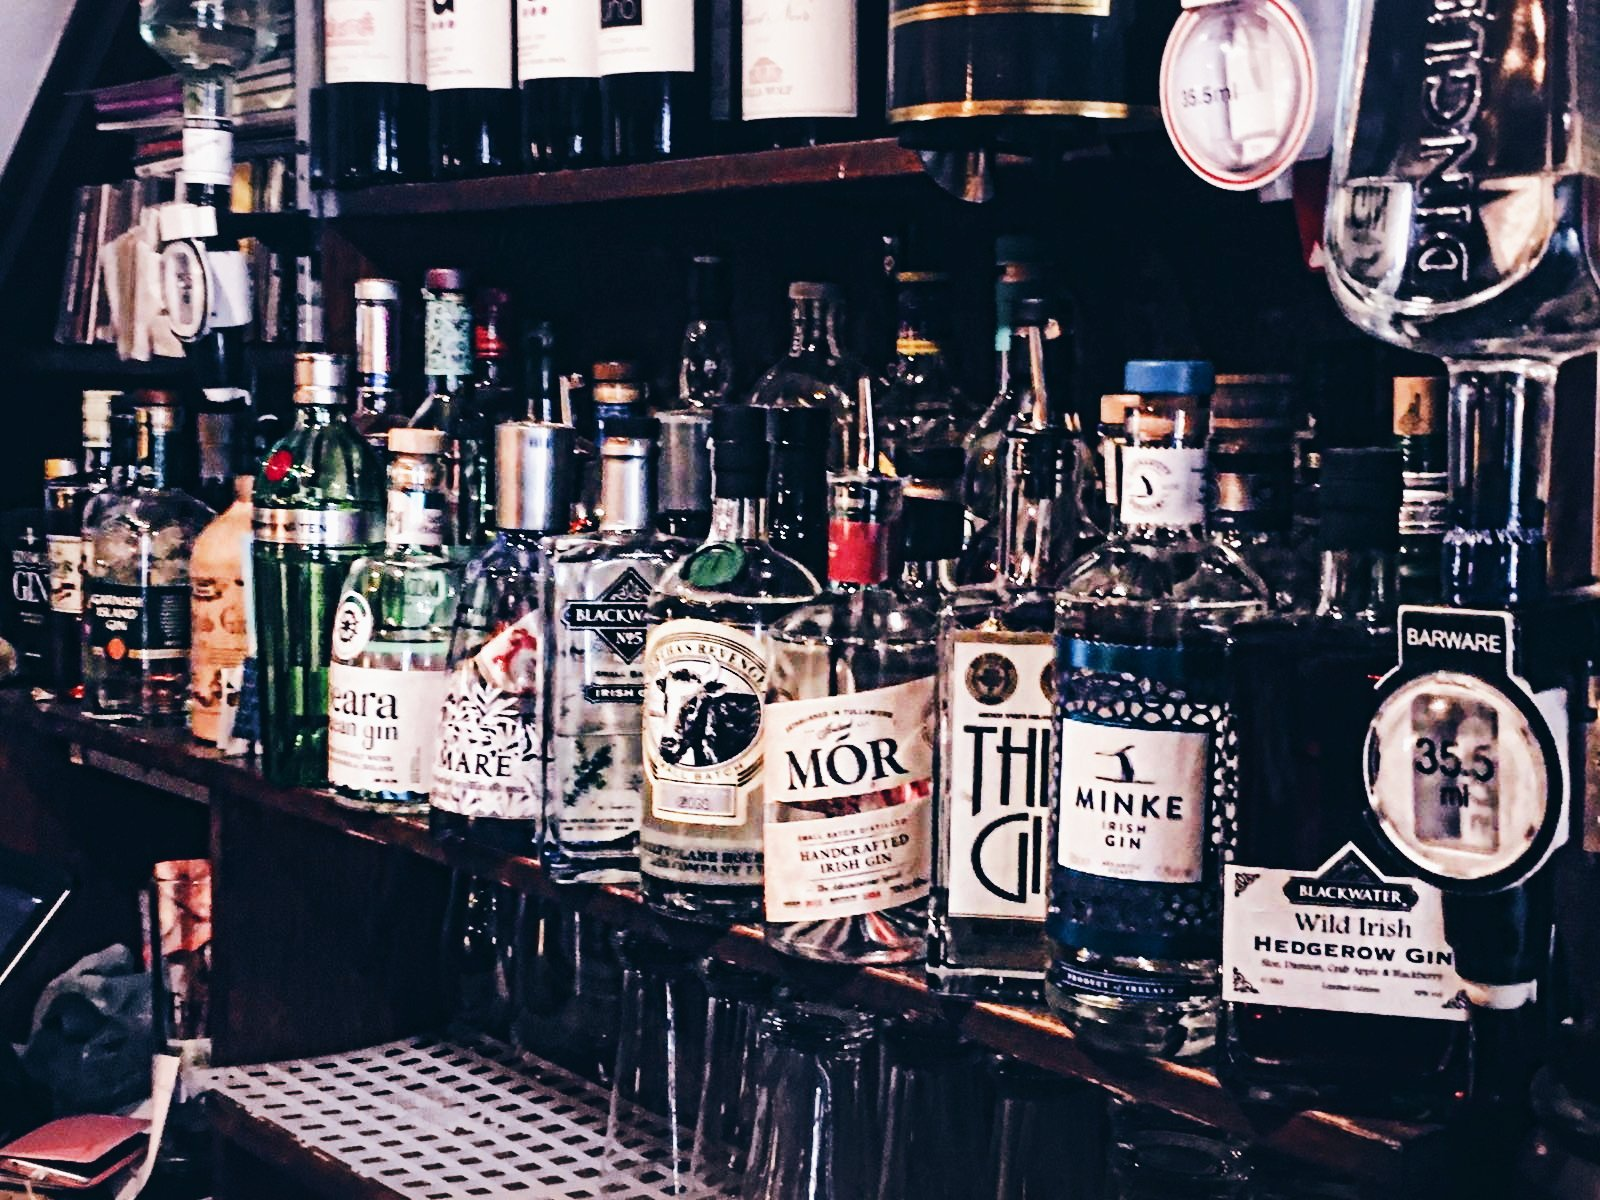 Selection of gin at monk's lane